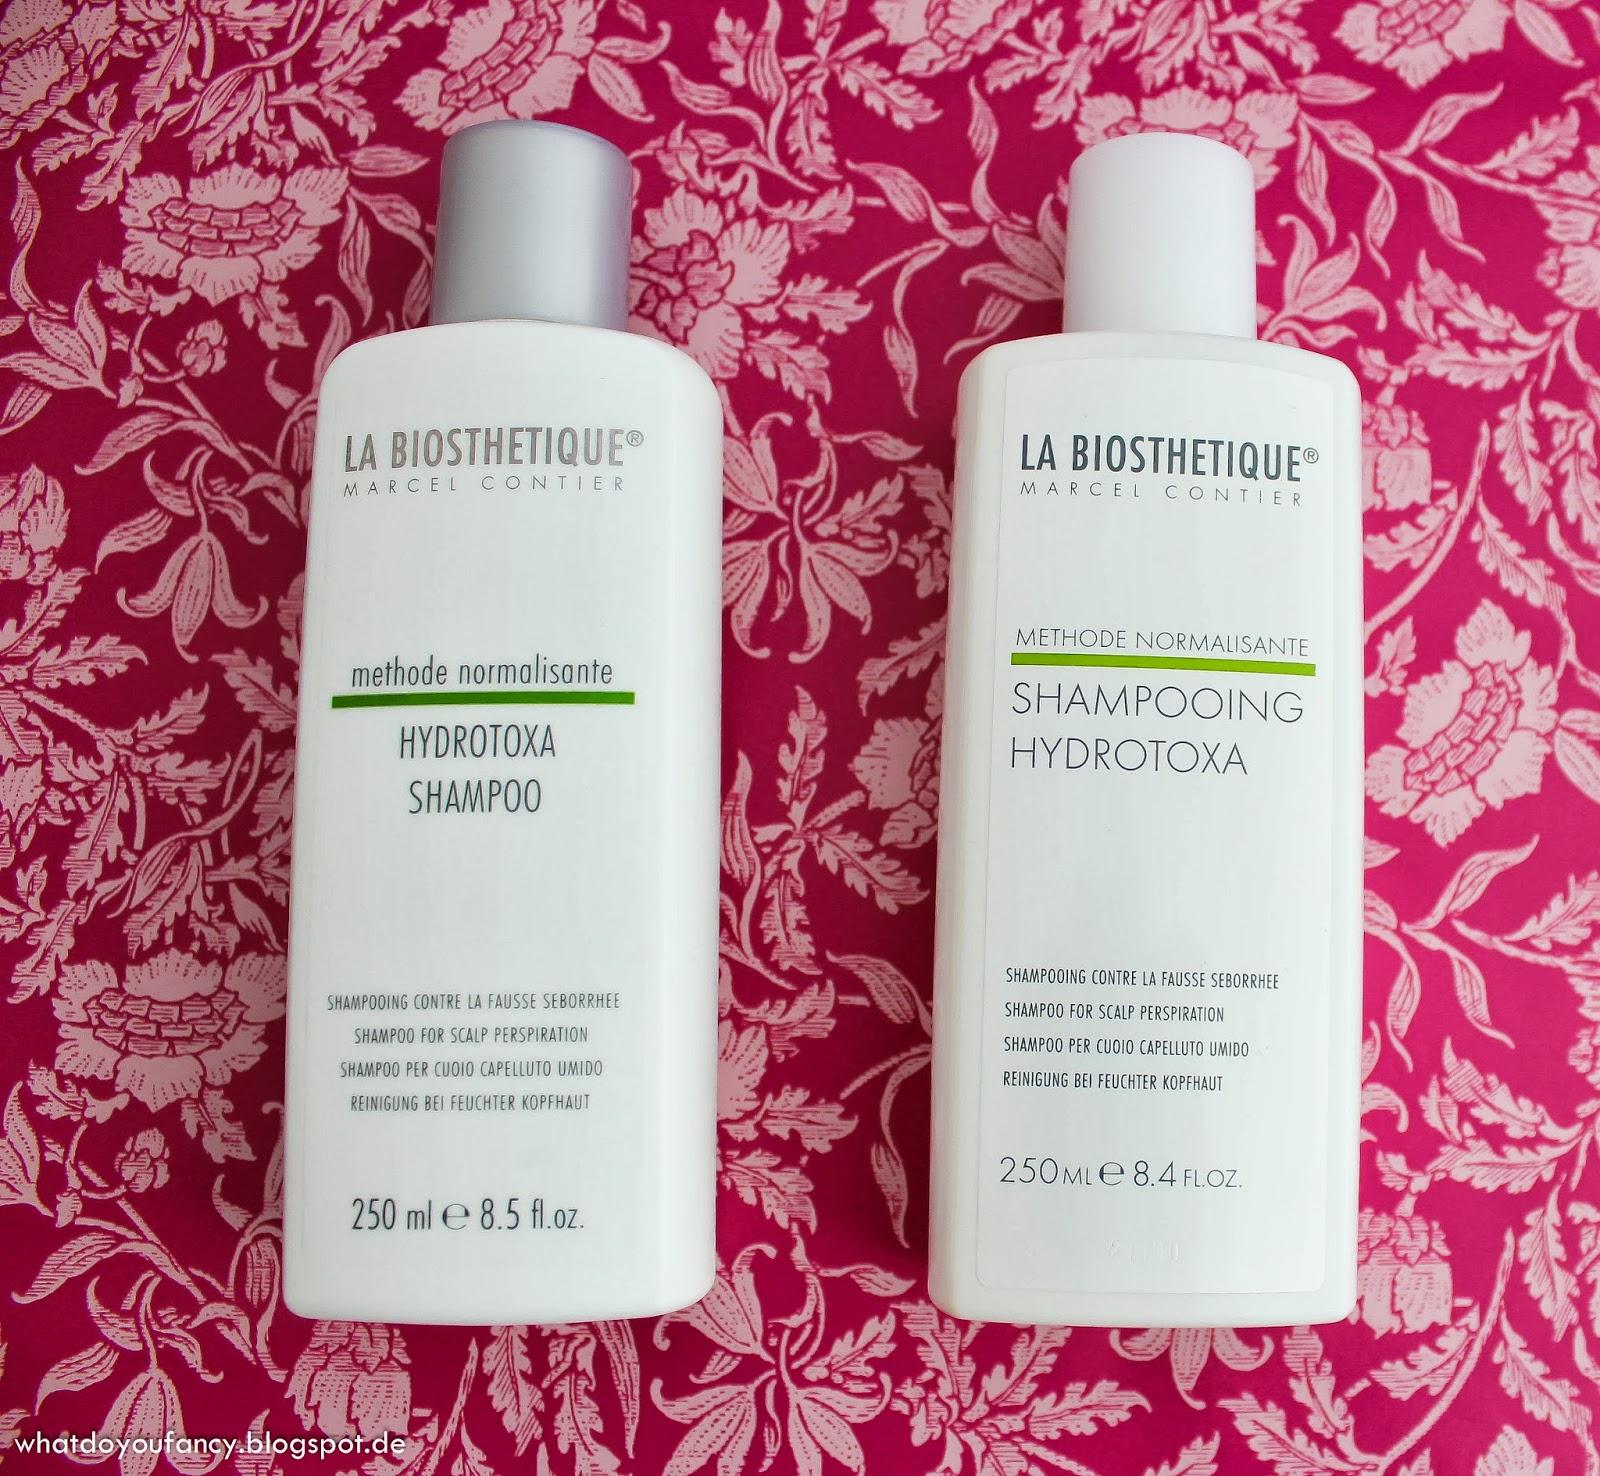 La Biosthétique Shampoo Hydrotoxa